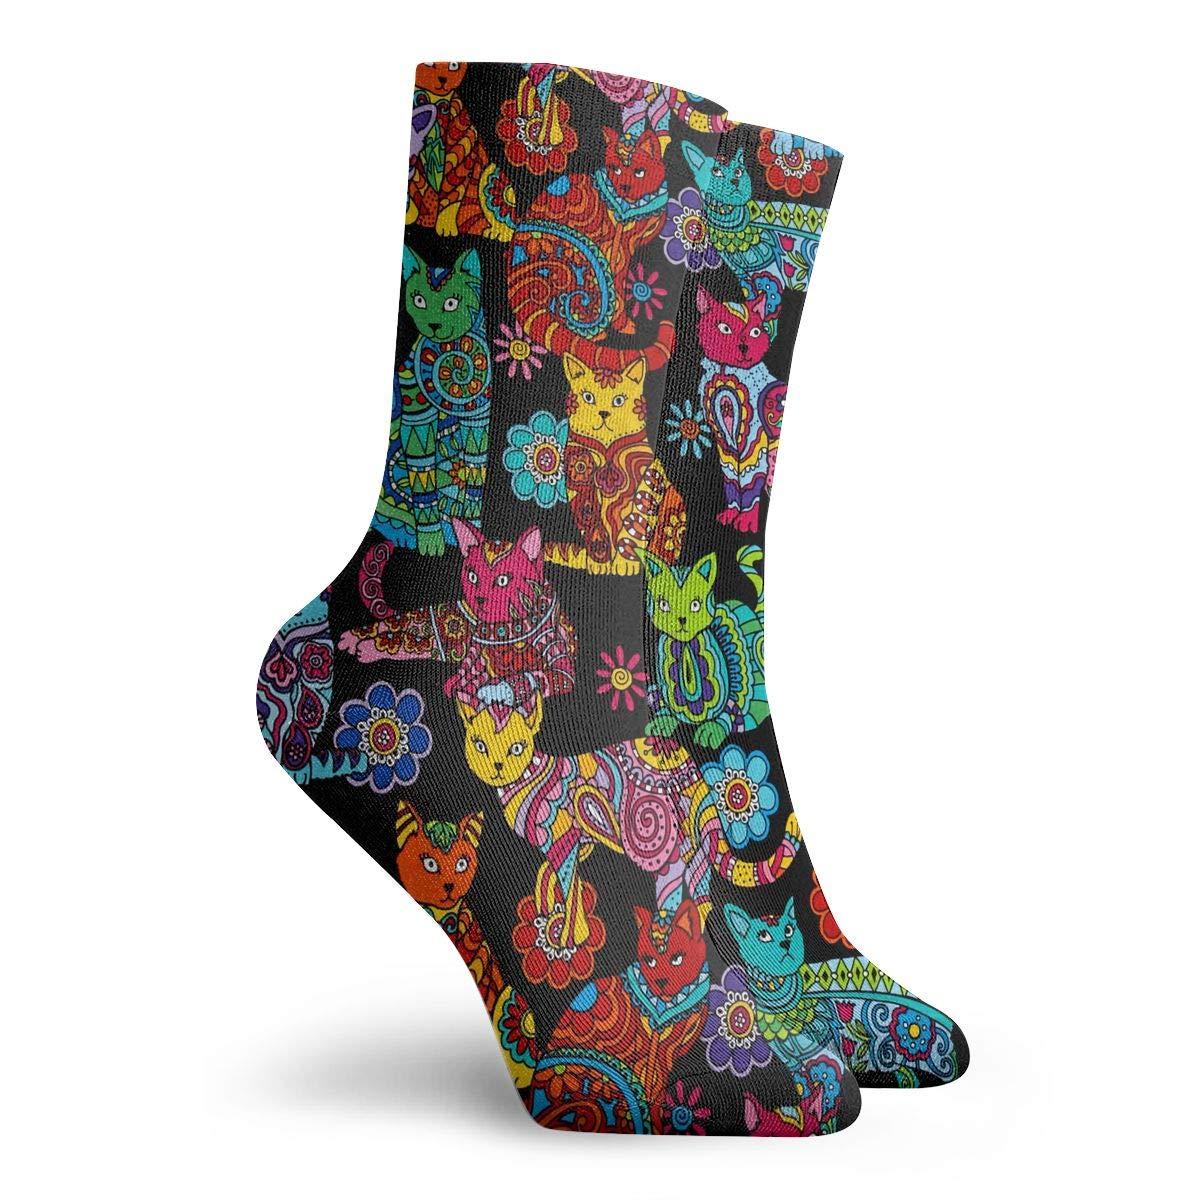 Colorful Cat Art Fashion Dress Socks Short Socks Leisure Travel 11.8 Inch